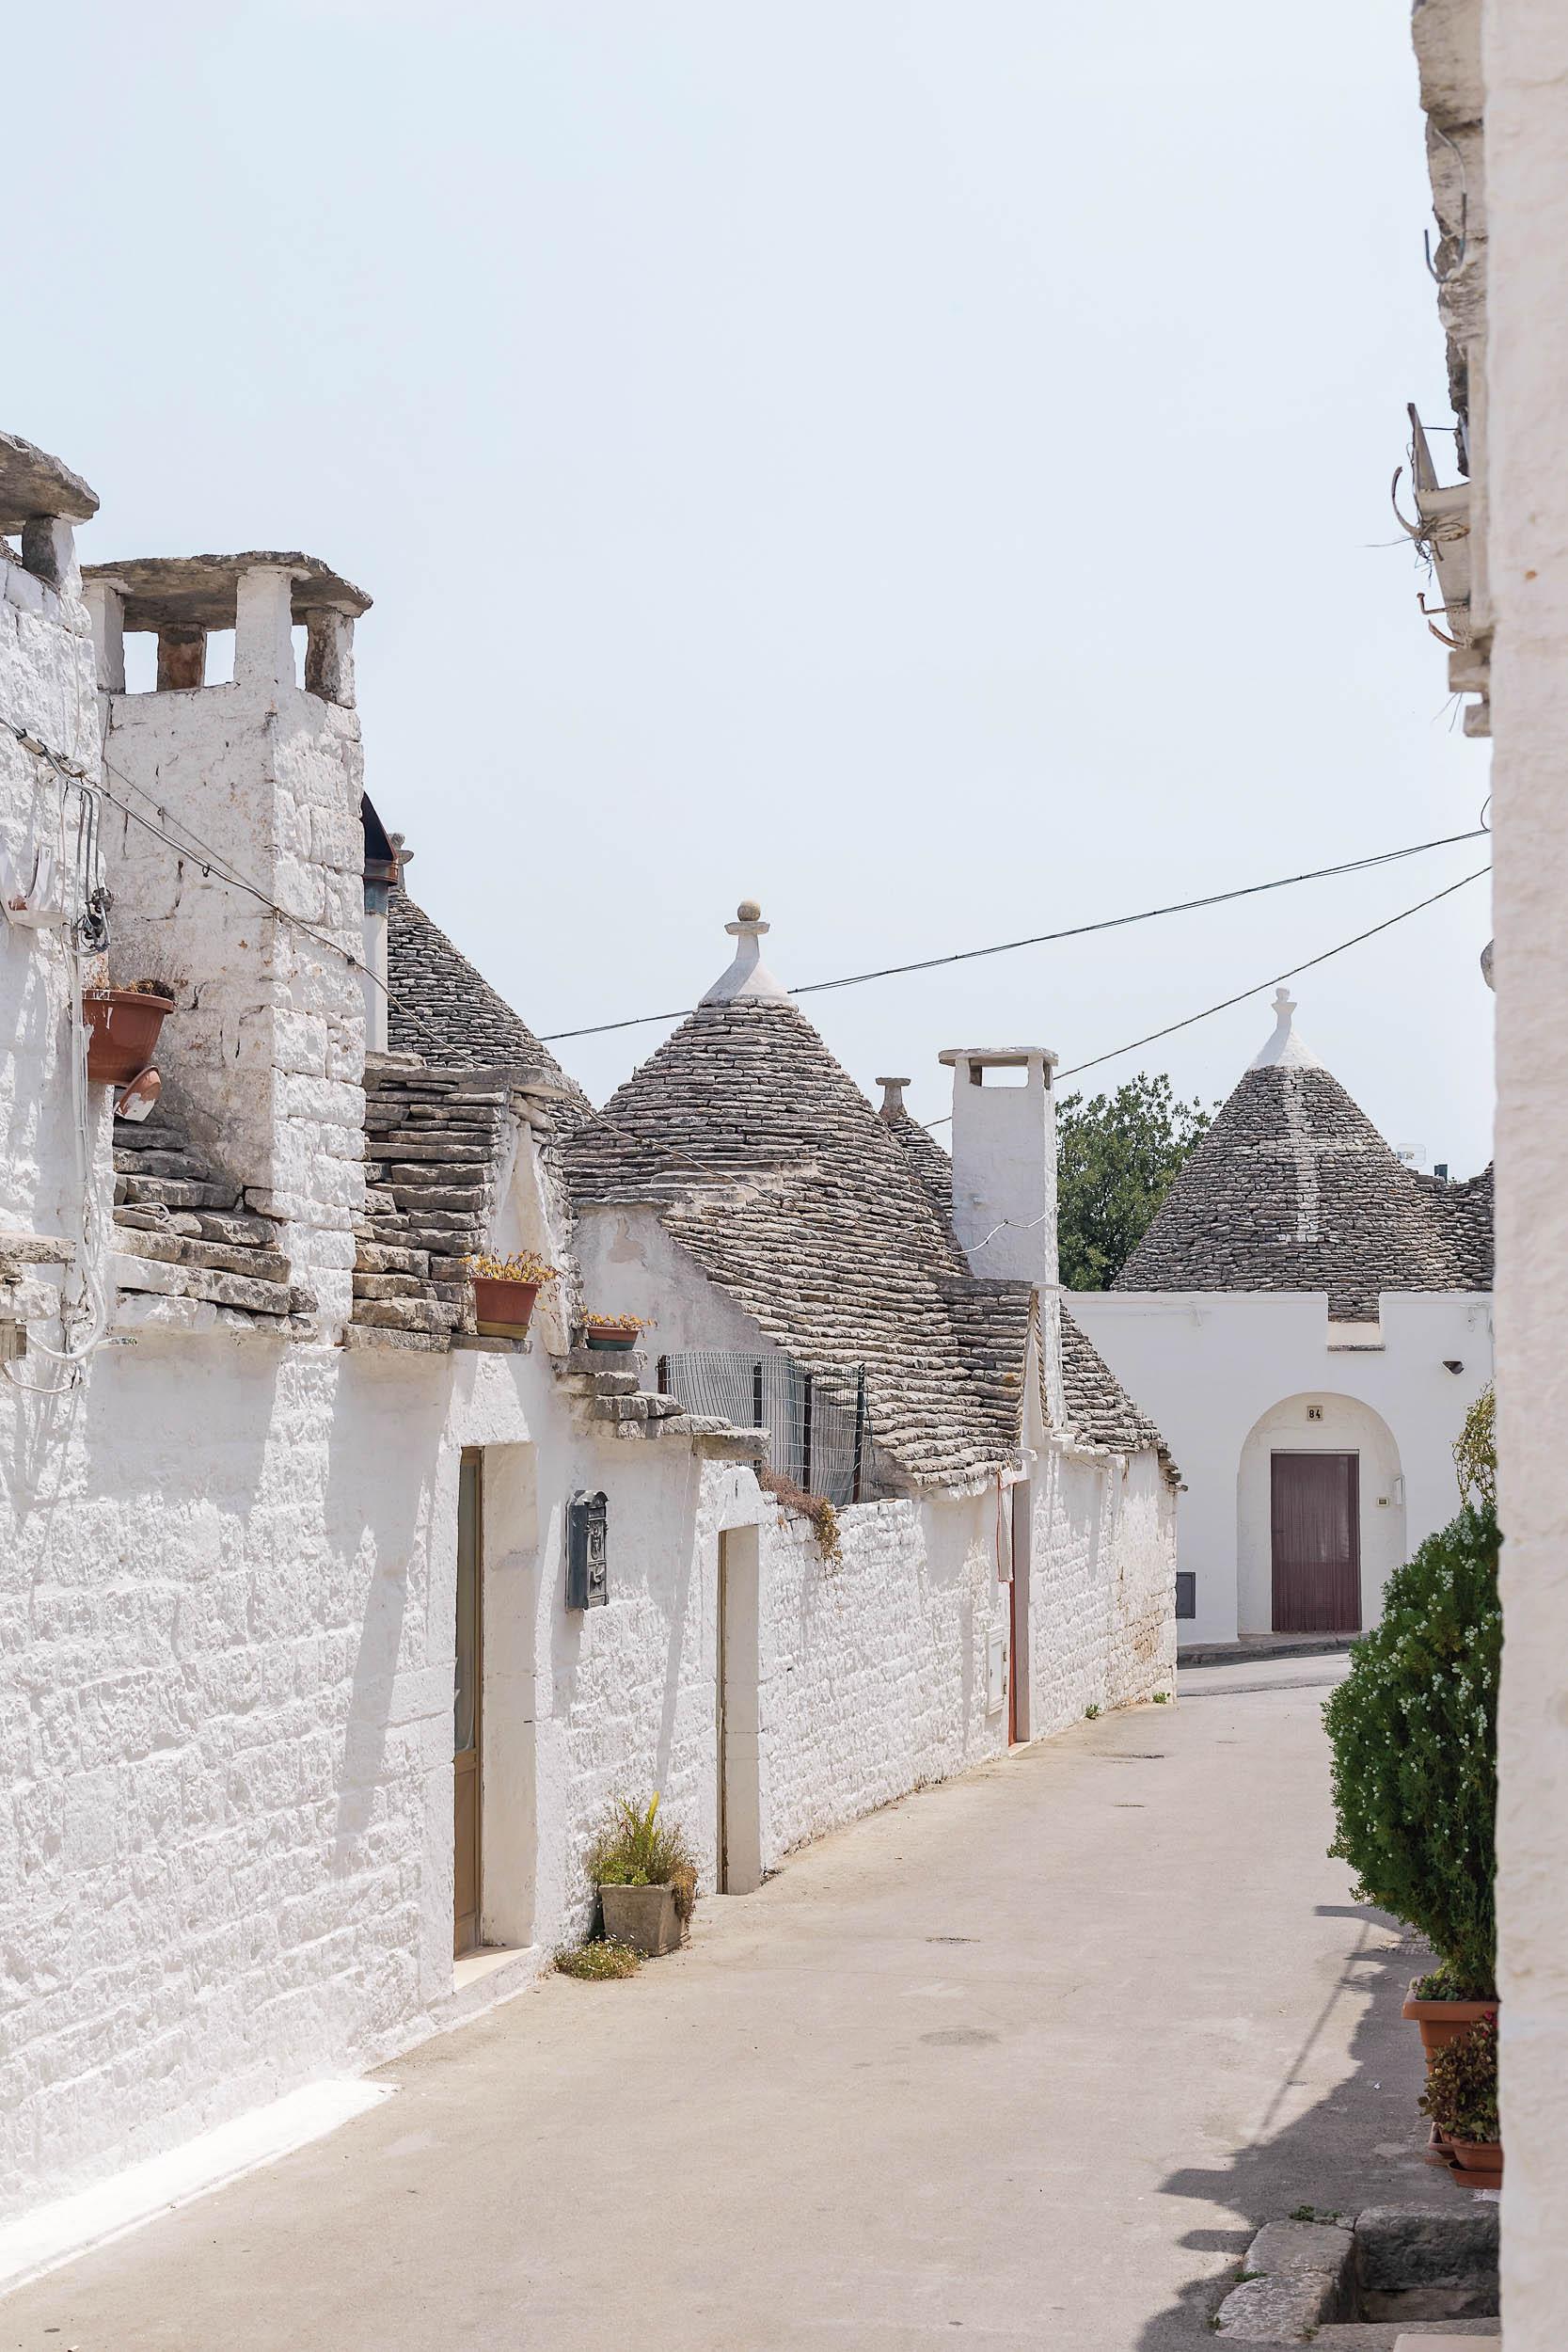 A picturesque street in Alberobello